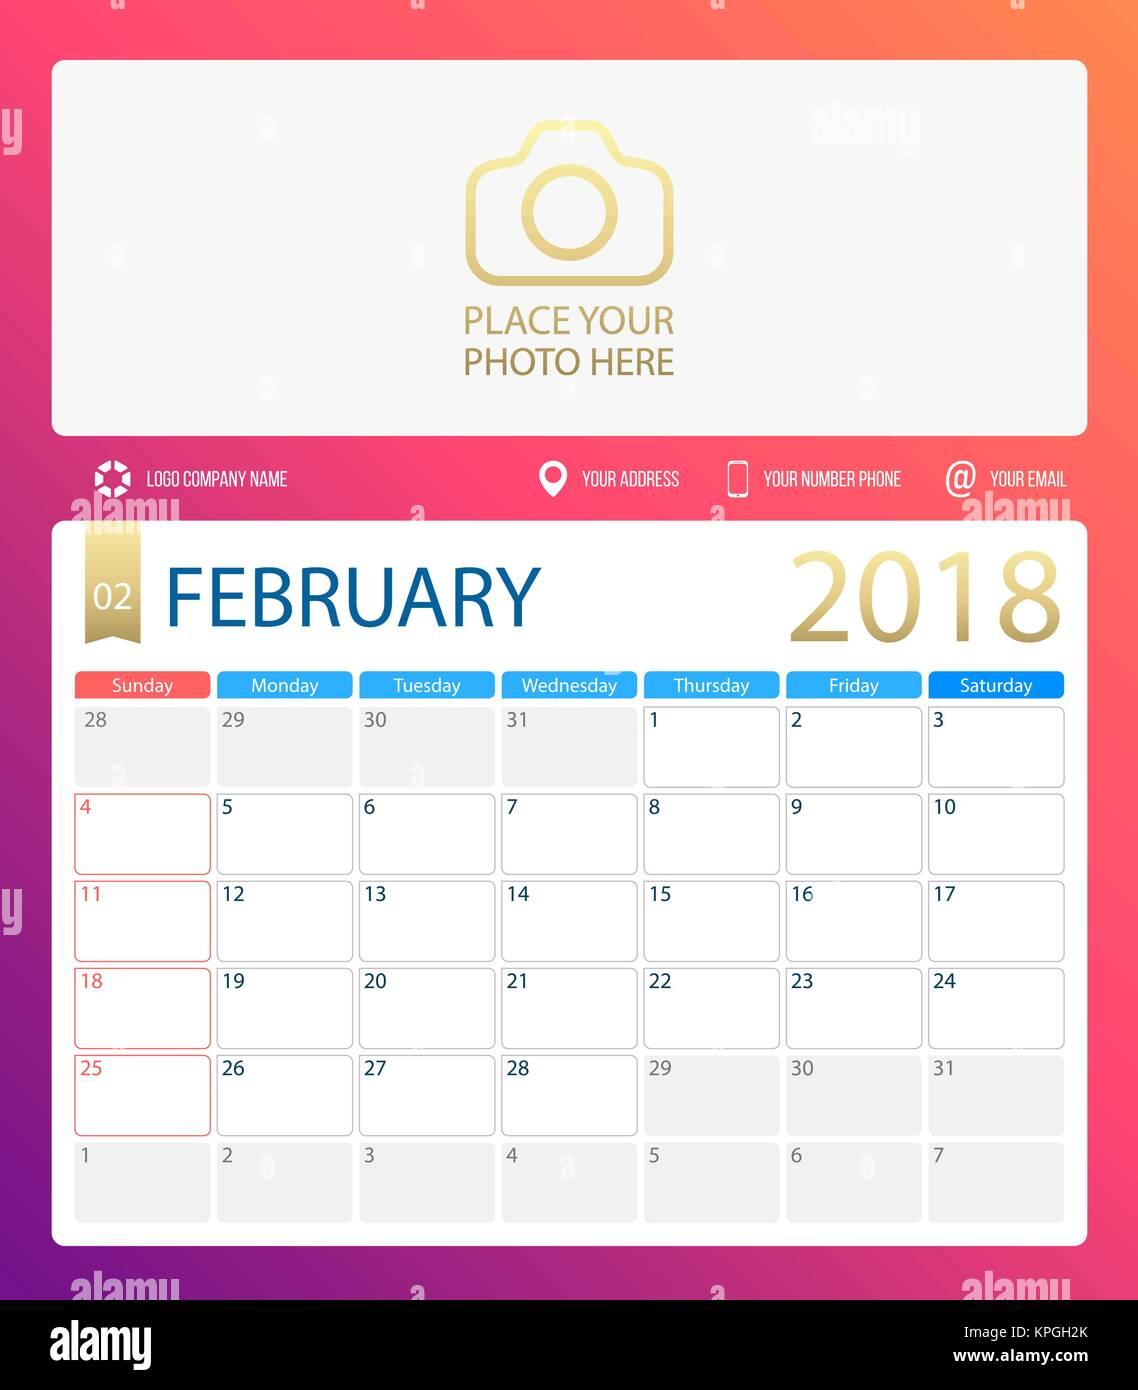 February Calendar Illustration : Calendar stock vector images alamy